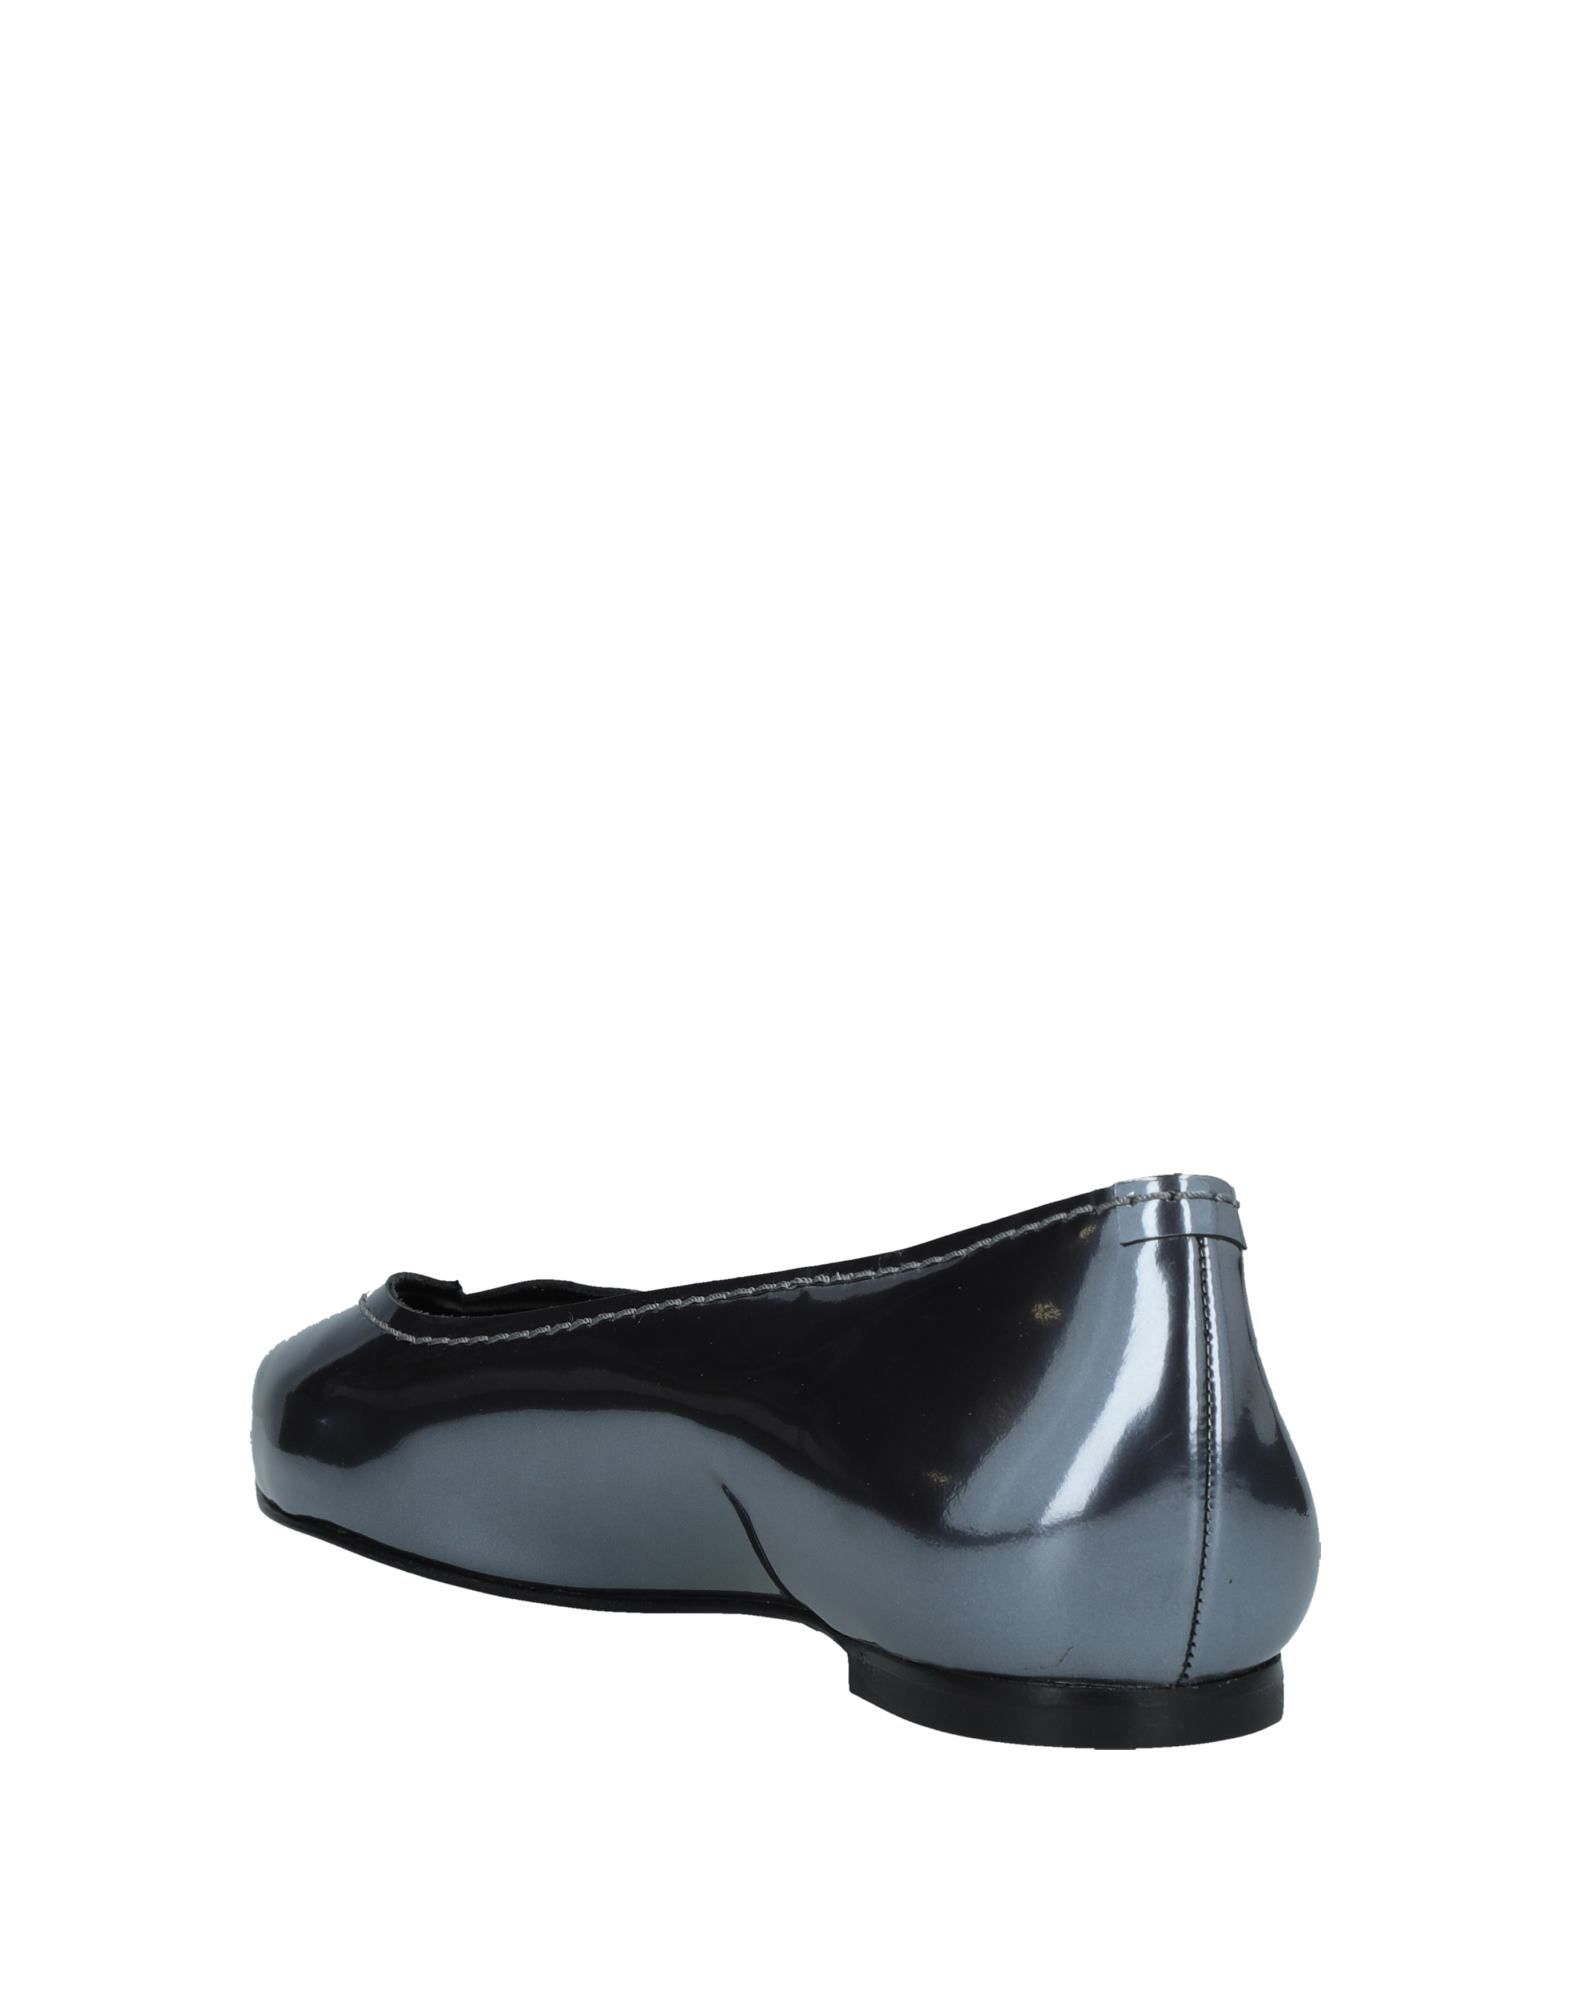 Pedro 11528347XAGut García Ballerinas Damen  11528347XAGut Pedro aussehende strapazierfähige Schuhe a64050